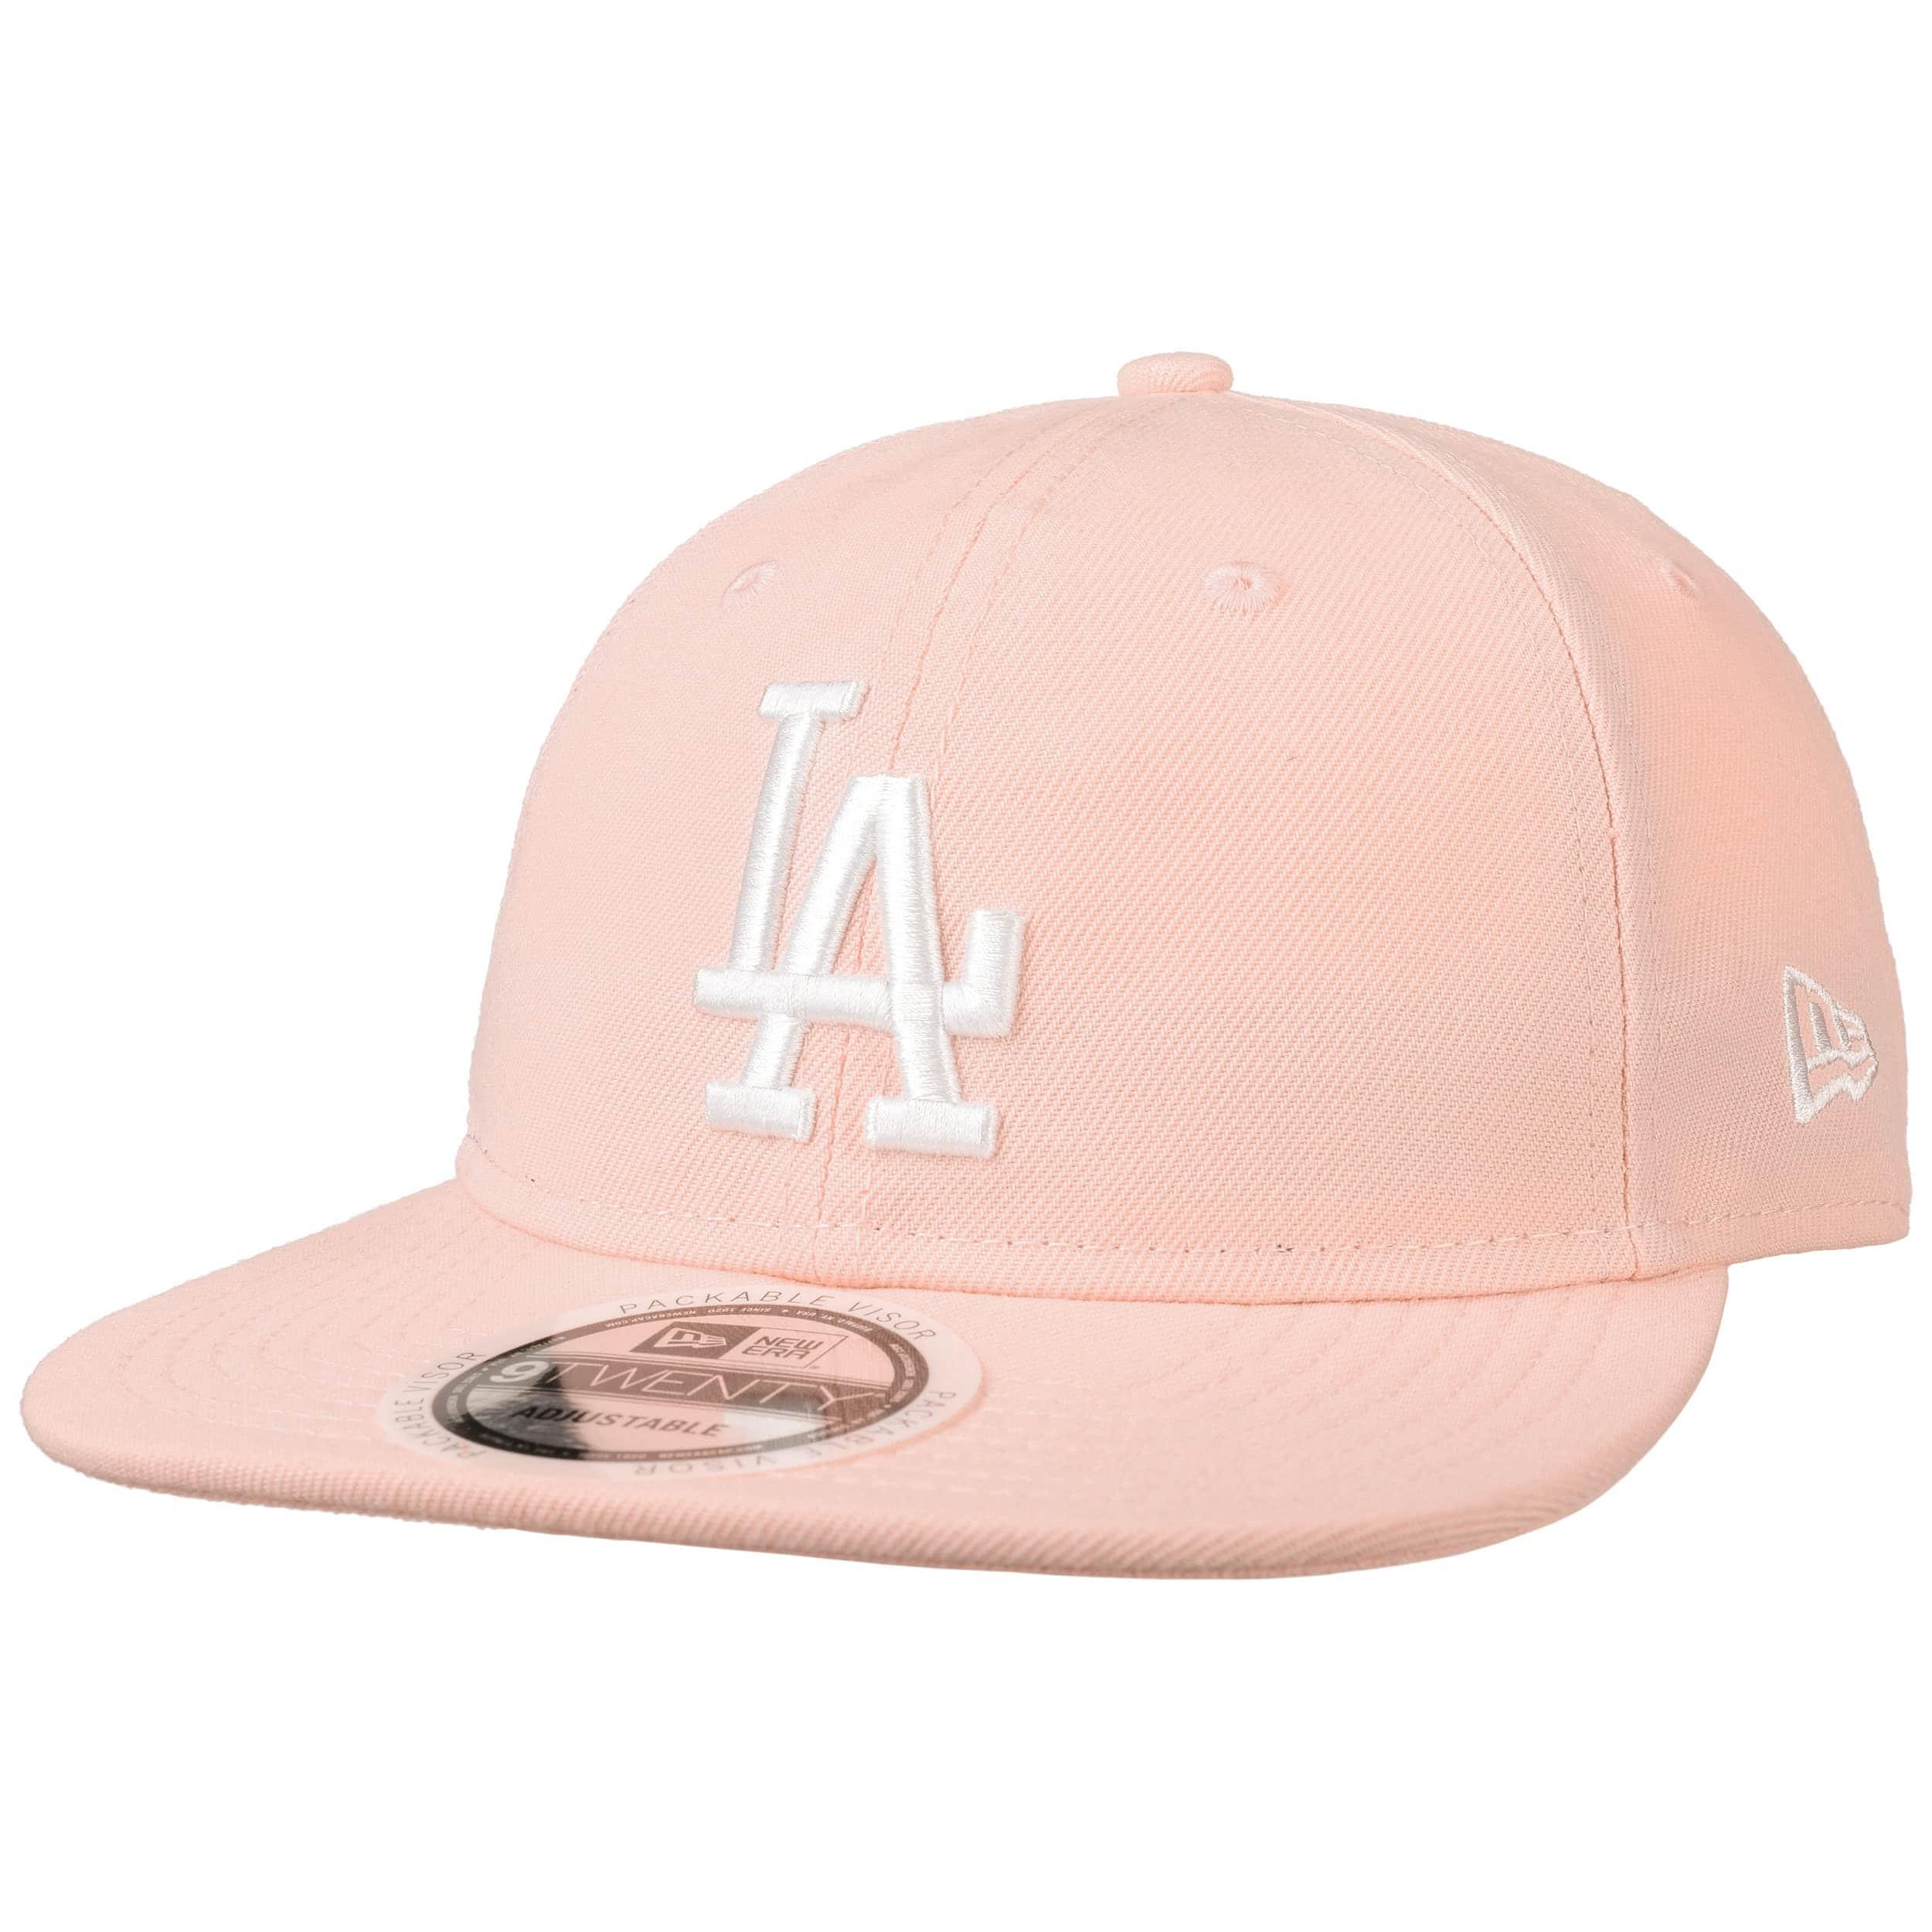 710b87cee 9Twenty Team Packable Dodgers Cap by New Era